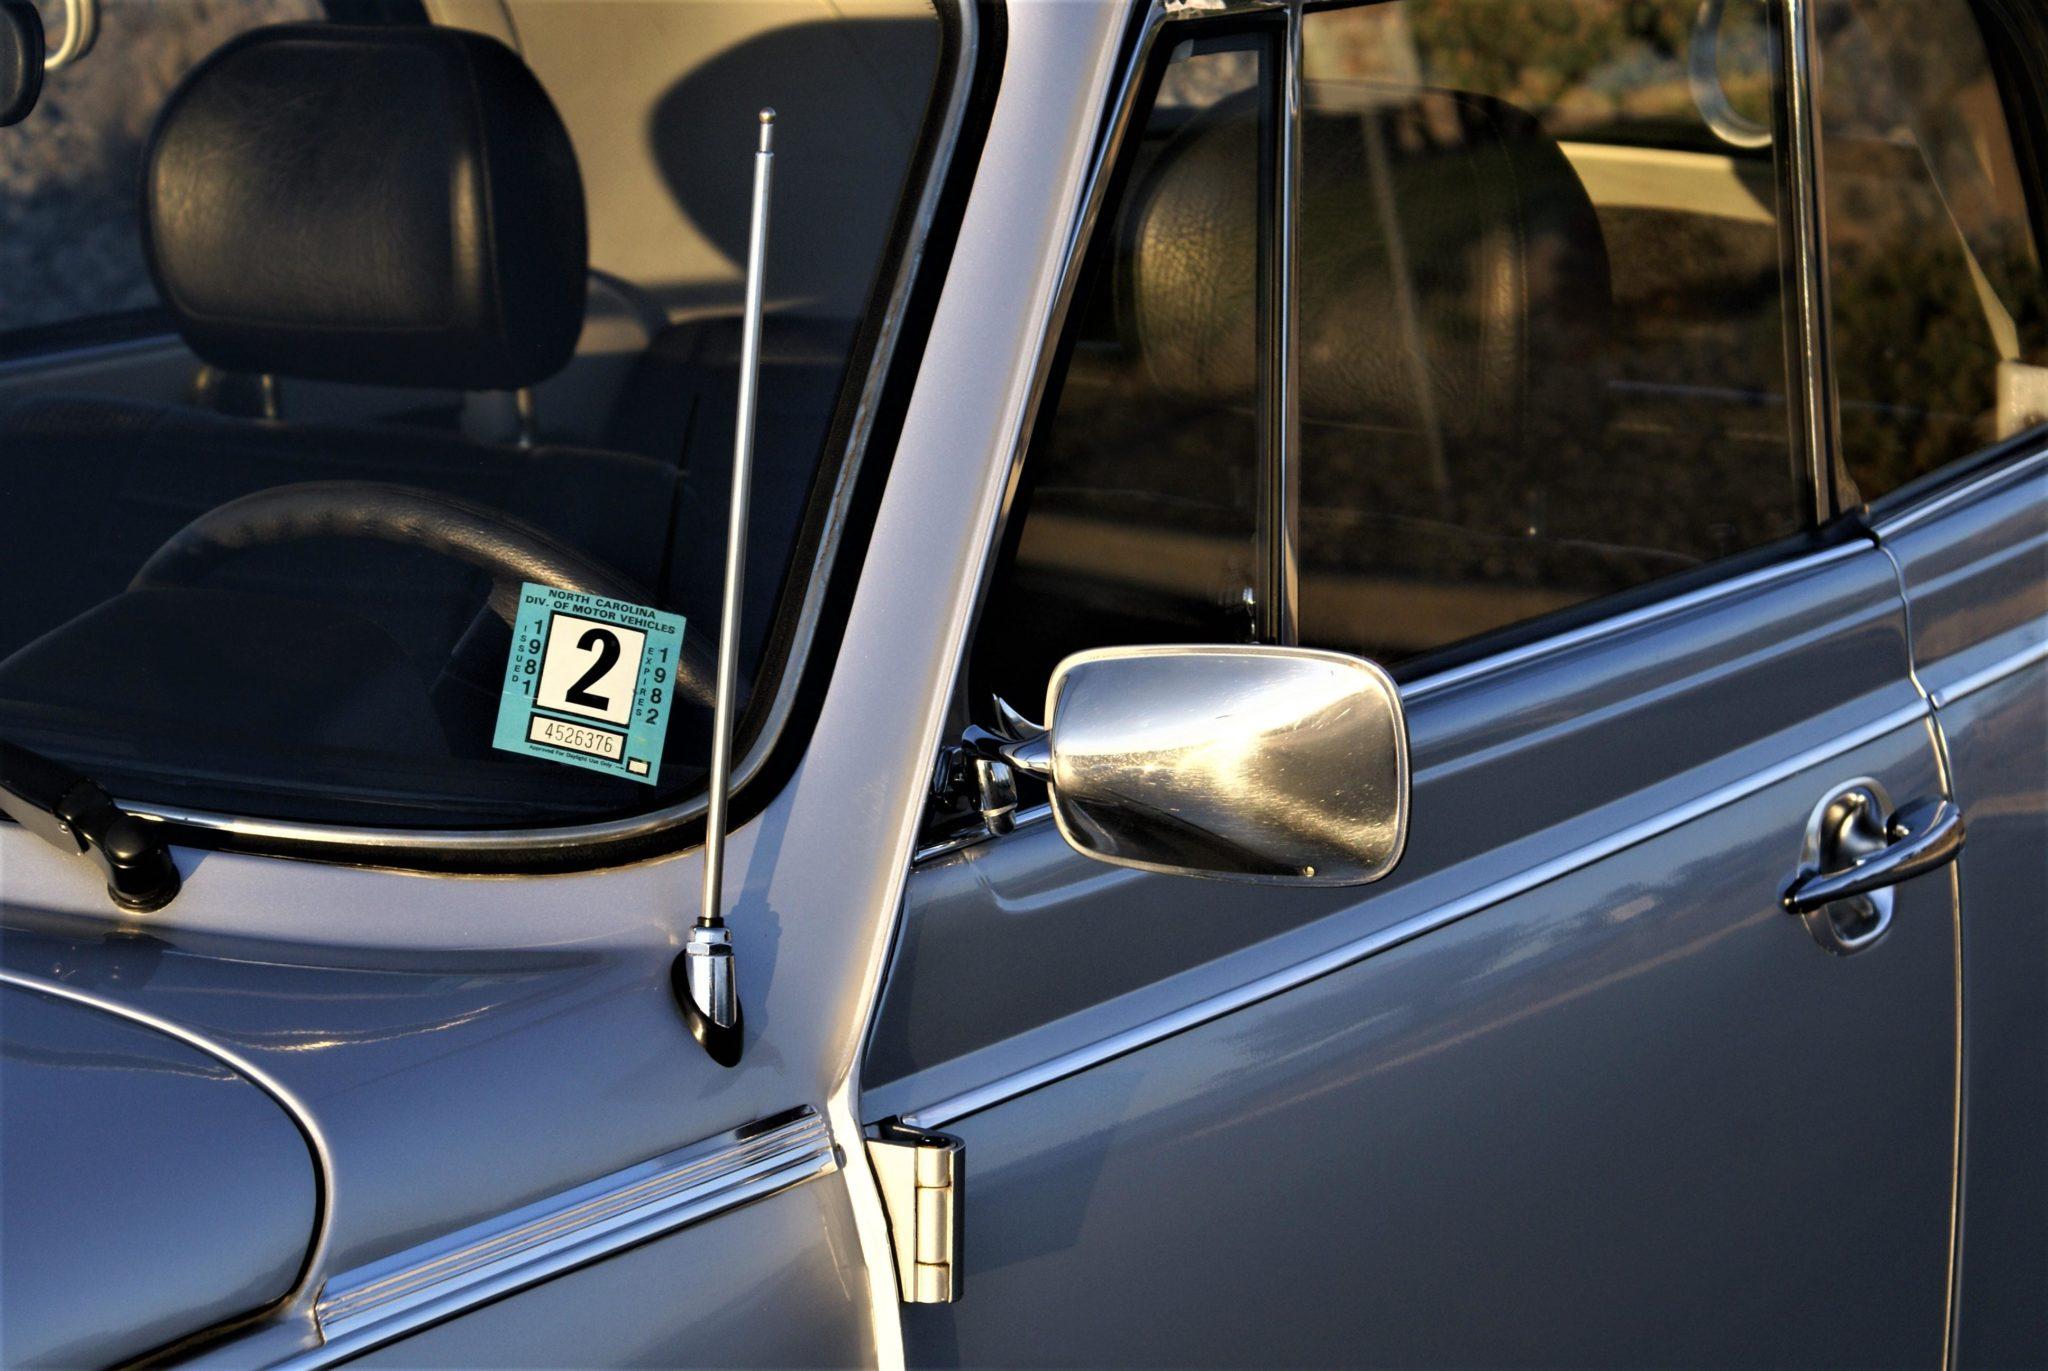 1979_volkswagen_super_beetle_cabriolet_1587072789a4edb9DSC07307-scaled